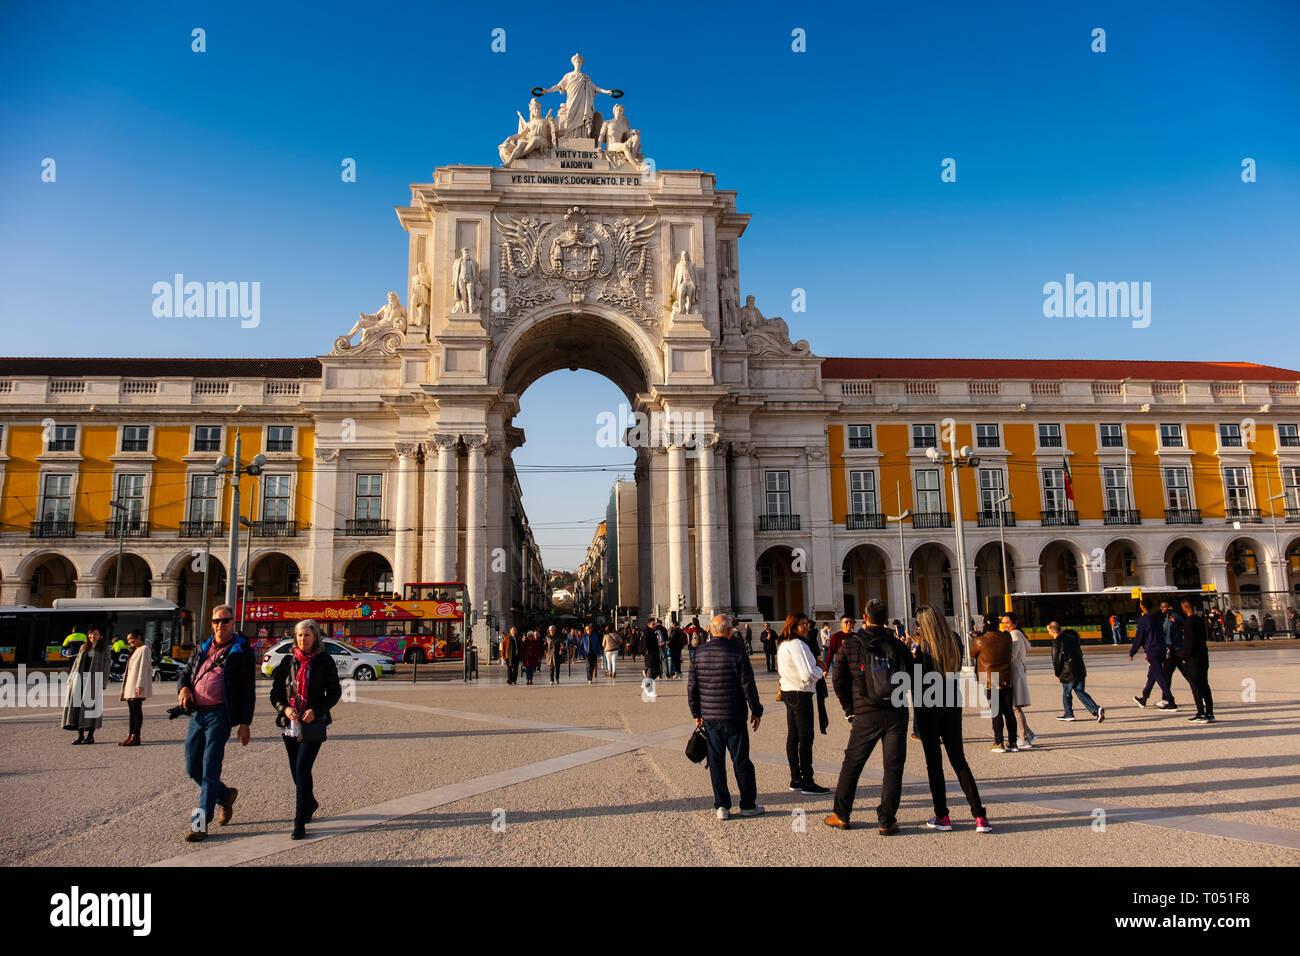 Triumphal Arch of Rua Augusta, Commerce Square. Lisbon, Portugal. Europe - Stock Image